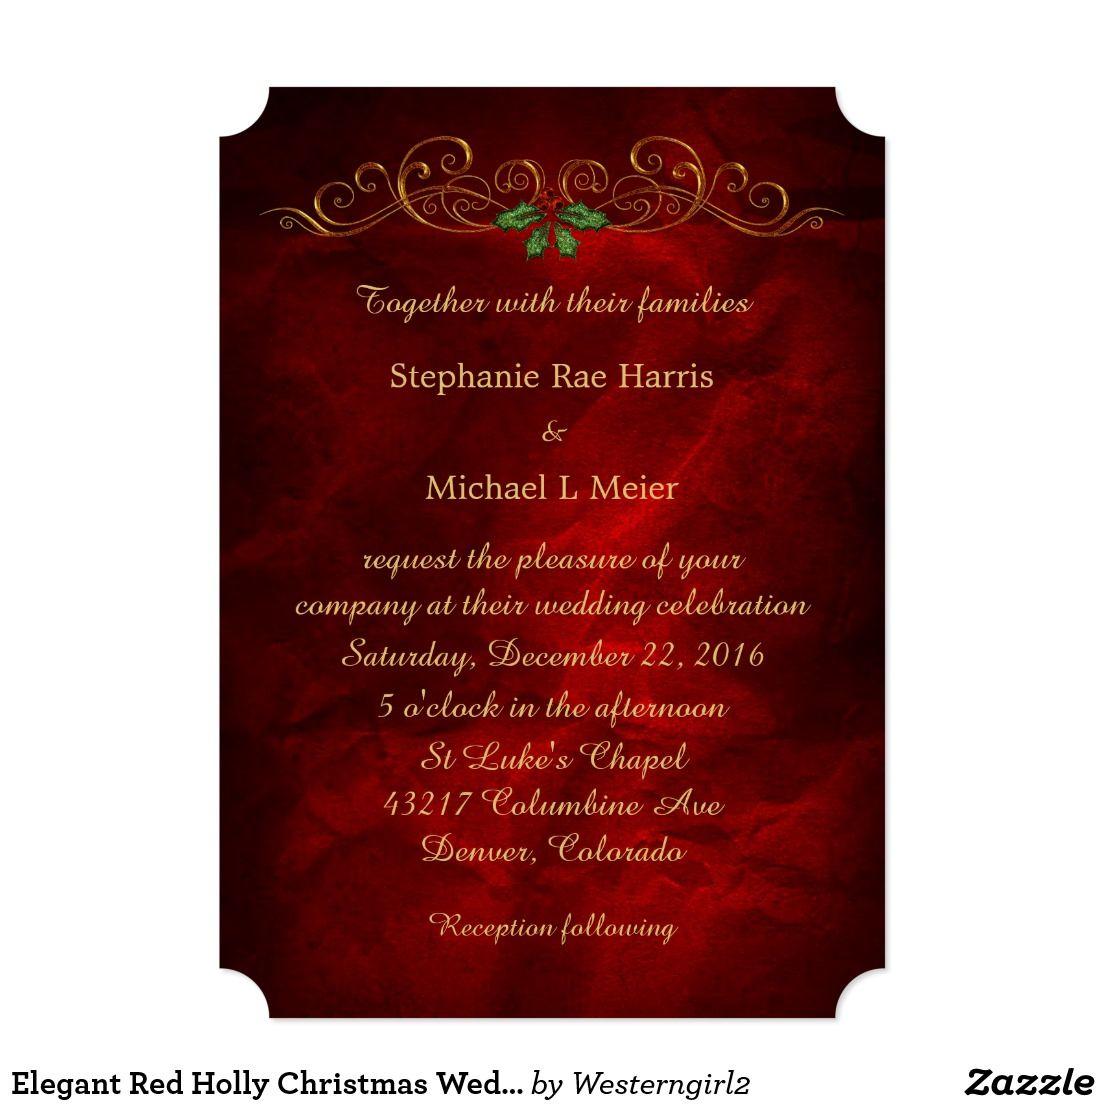 Elegant Red Holly Christmas Wedding Invitation   Winter Wedding ...